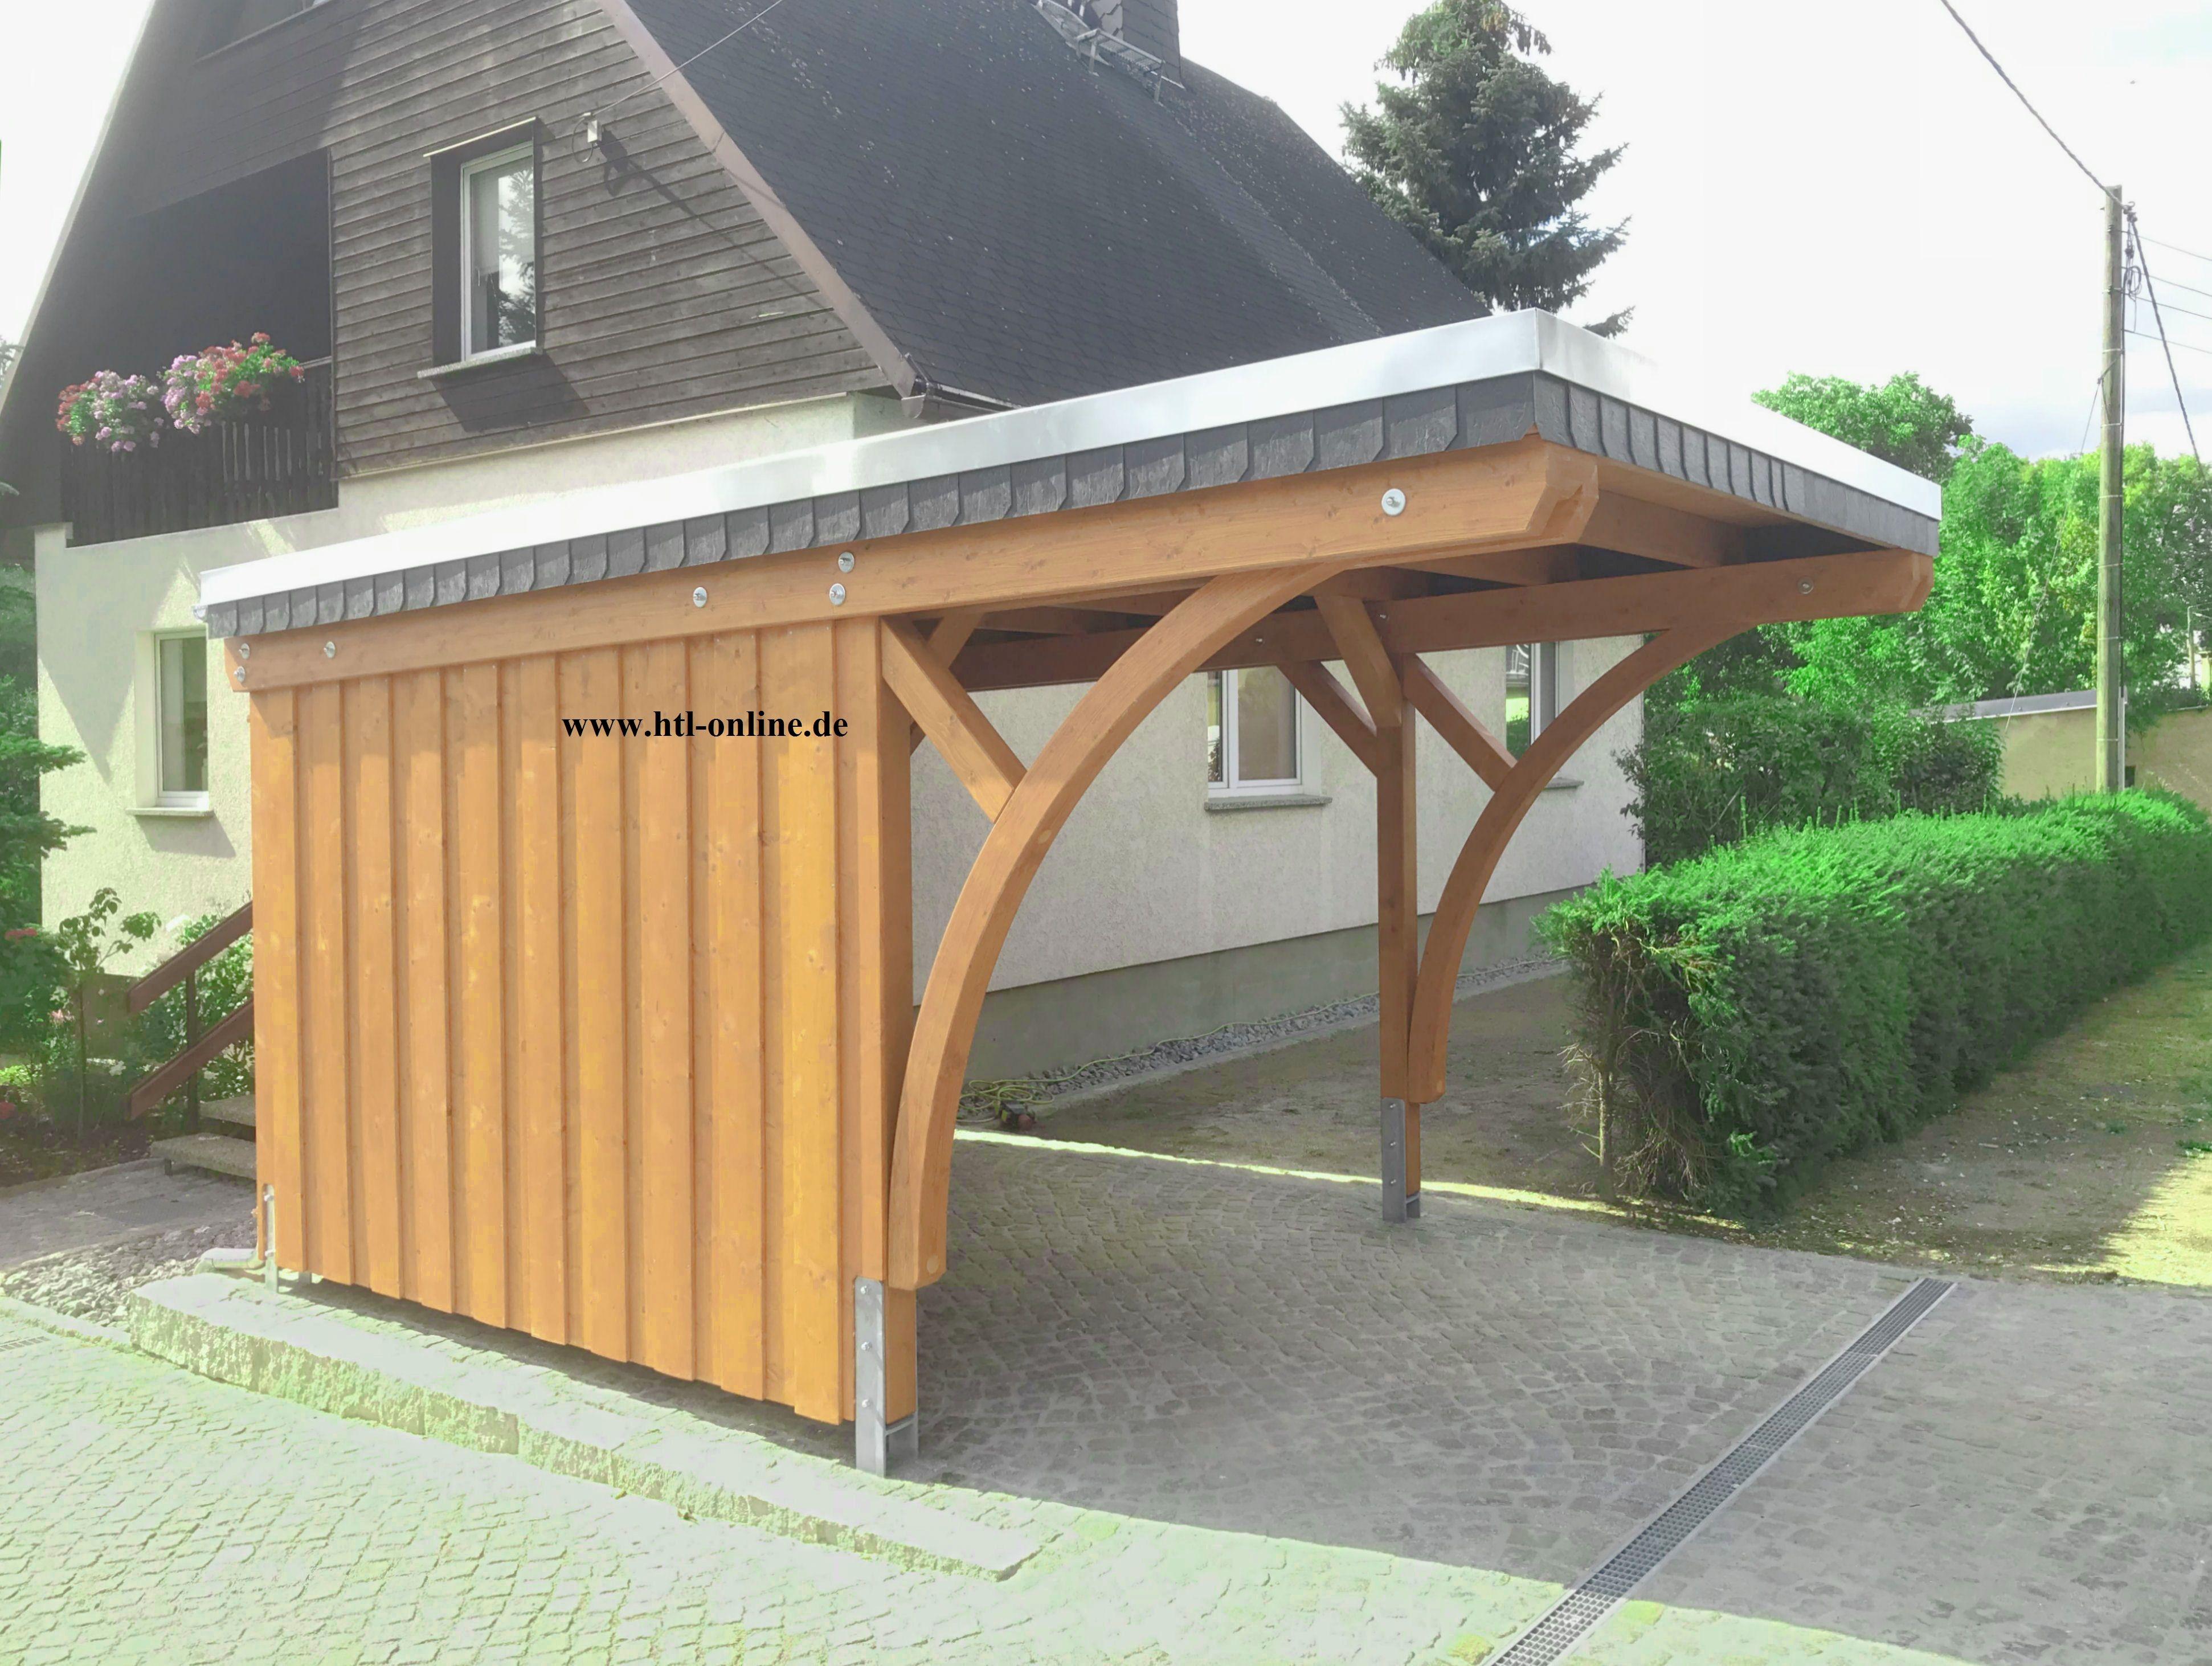 Pin Von Rene Richter Auf Carport Carport Holz Carport Carports